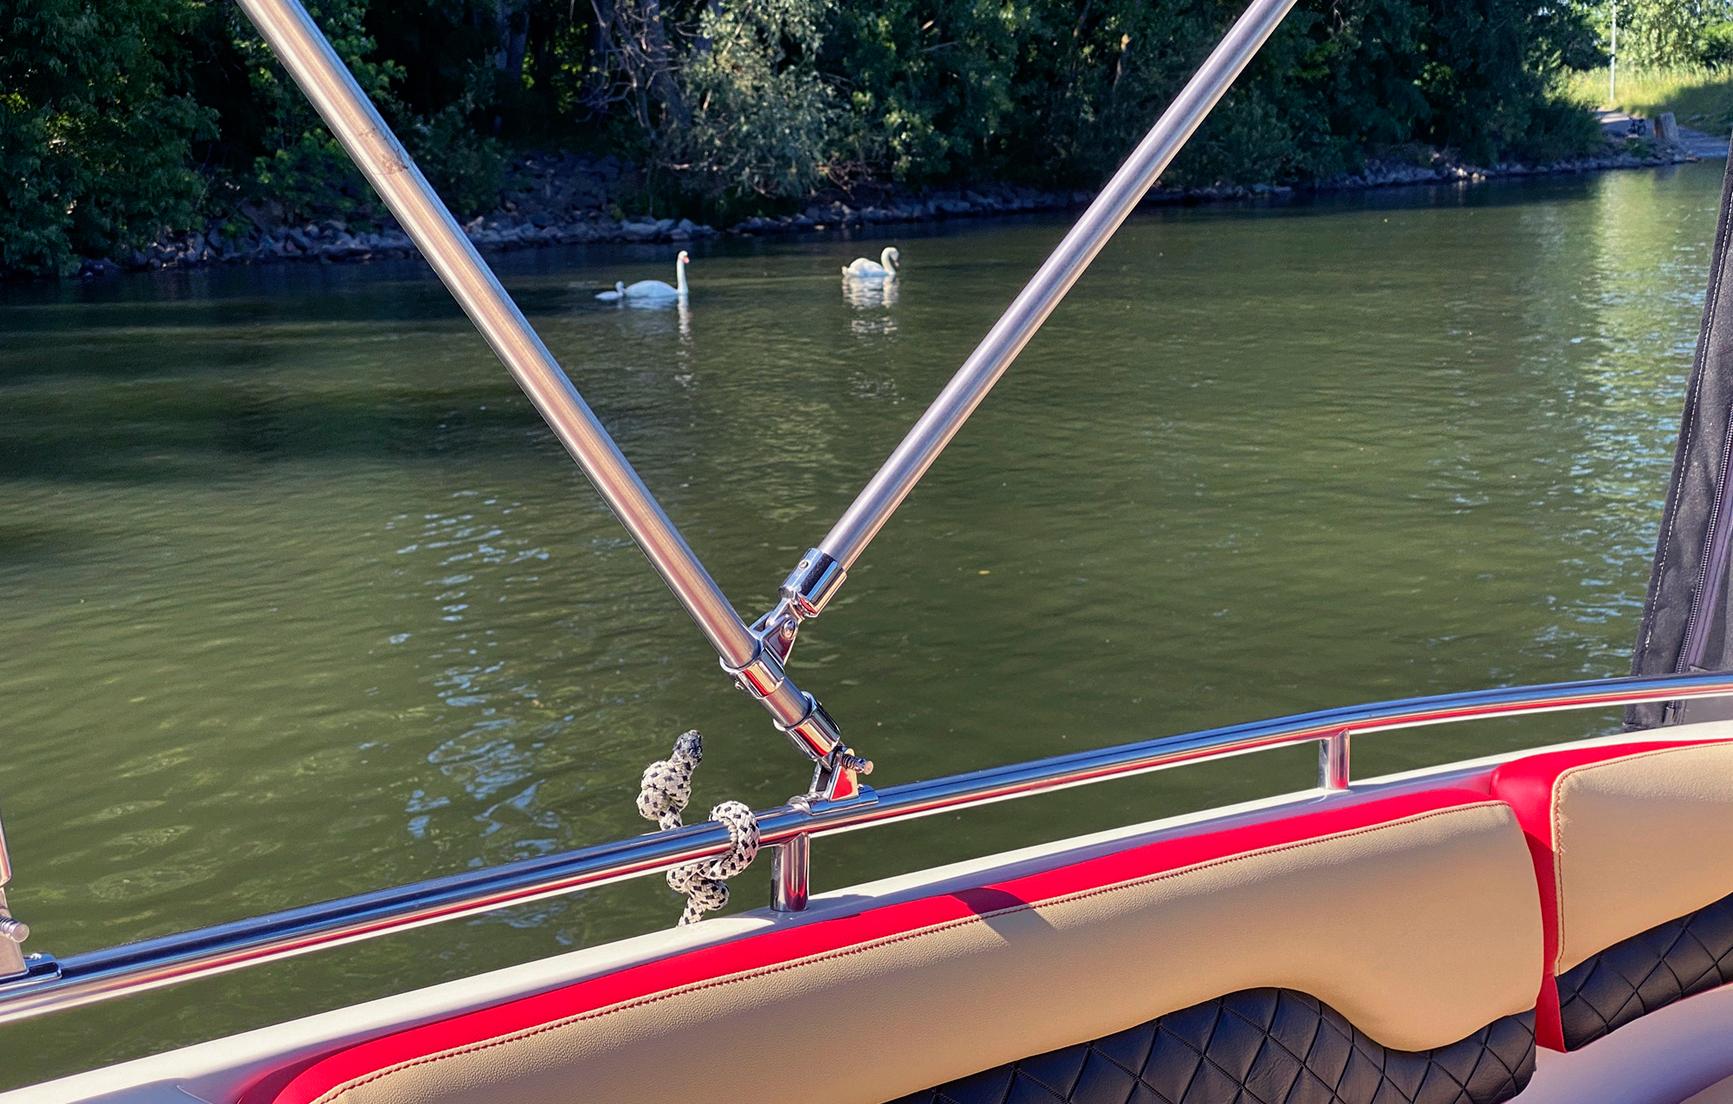 speedboot-fahren-frankfurt-am-main-bg4